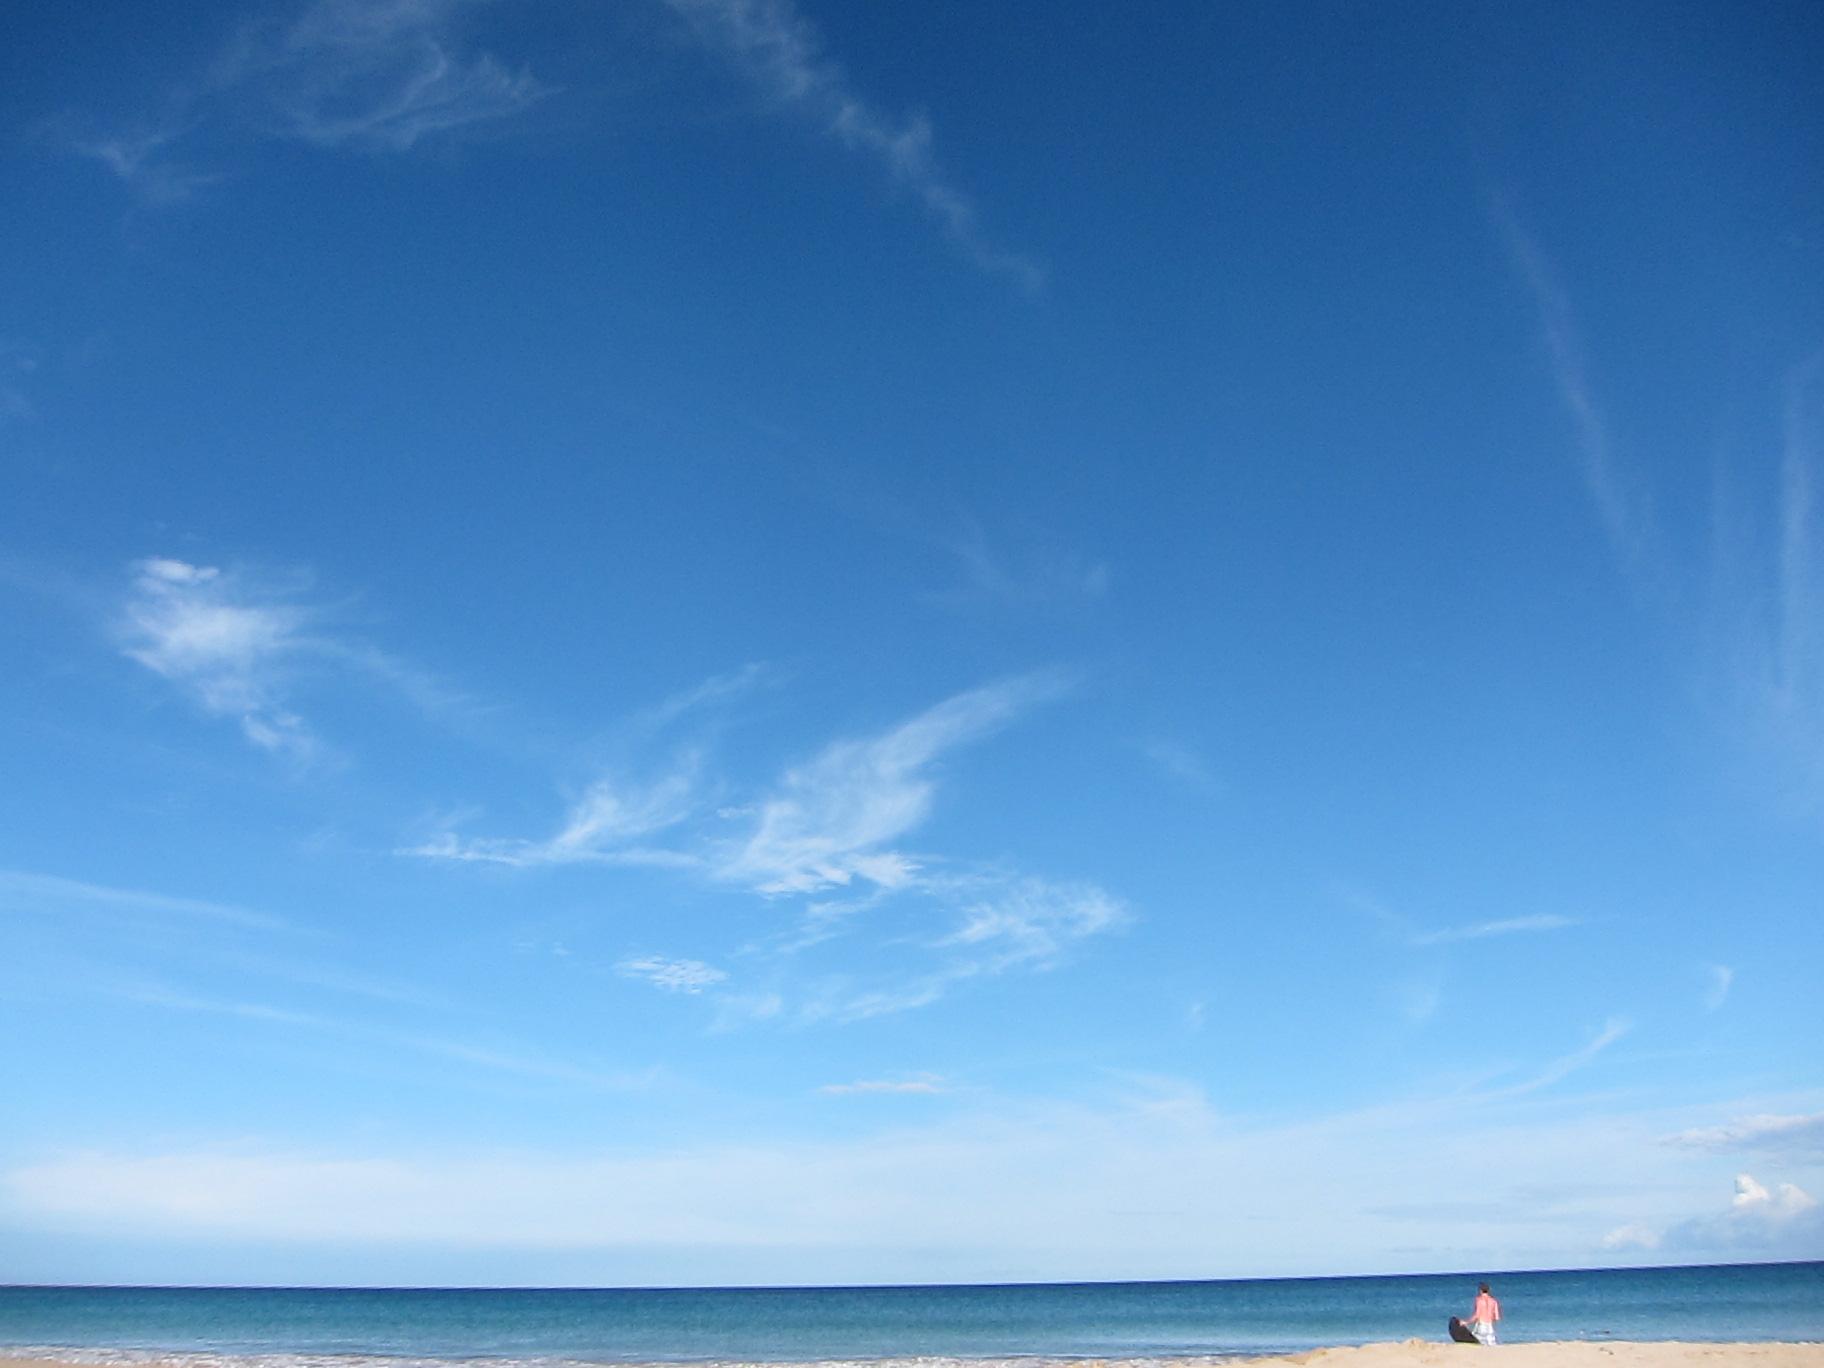 Bright sunshine from cloudy sky   Aloha! from Big Island